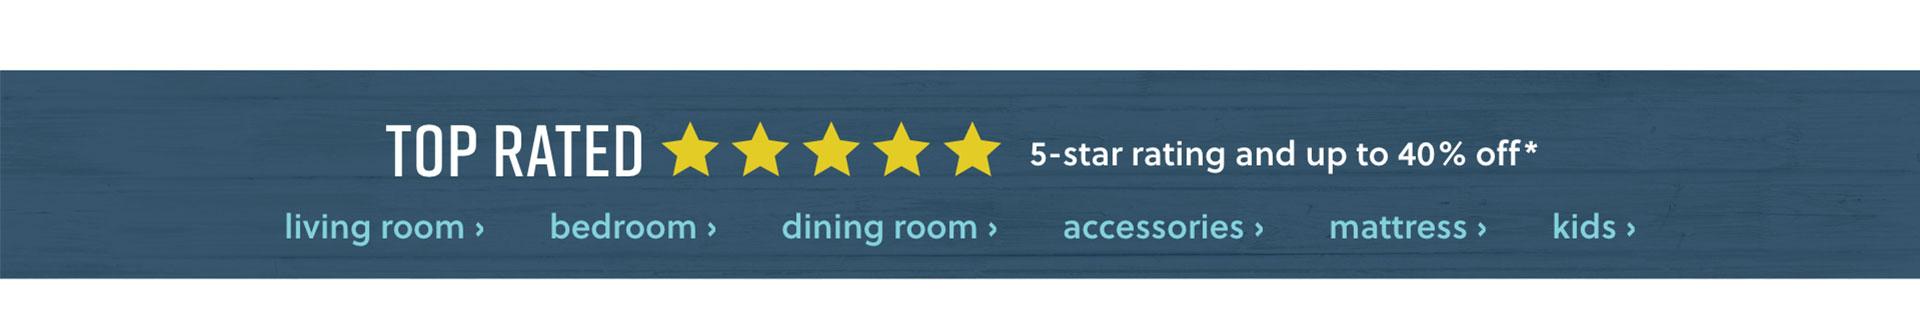 Top Rated Living Room Bedroom, Dining Room, Accessories, Mattress, Kids